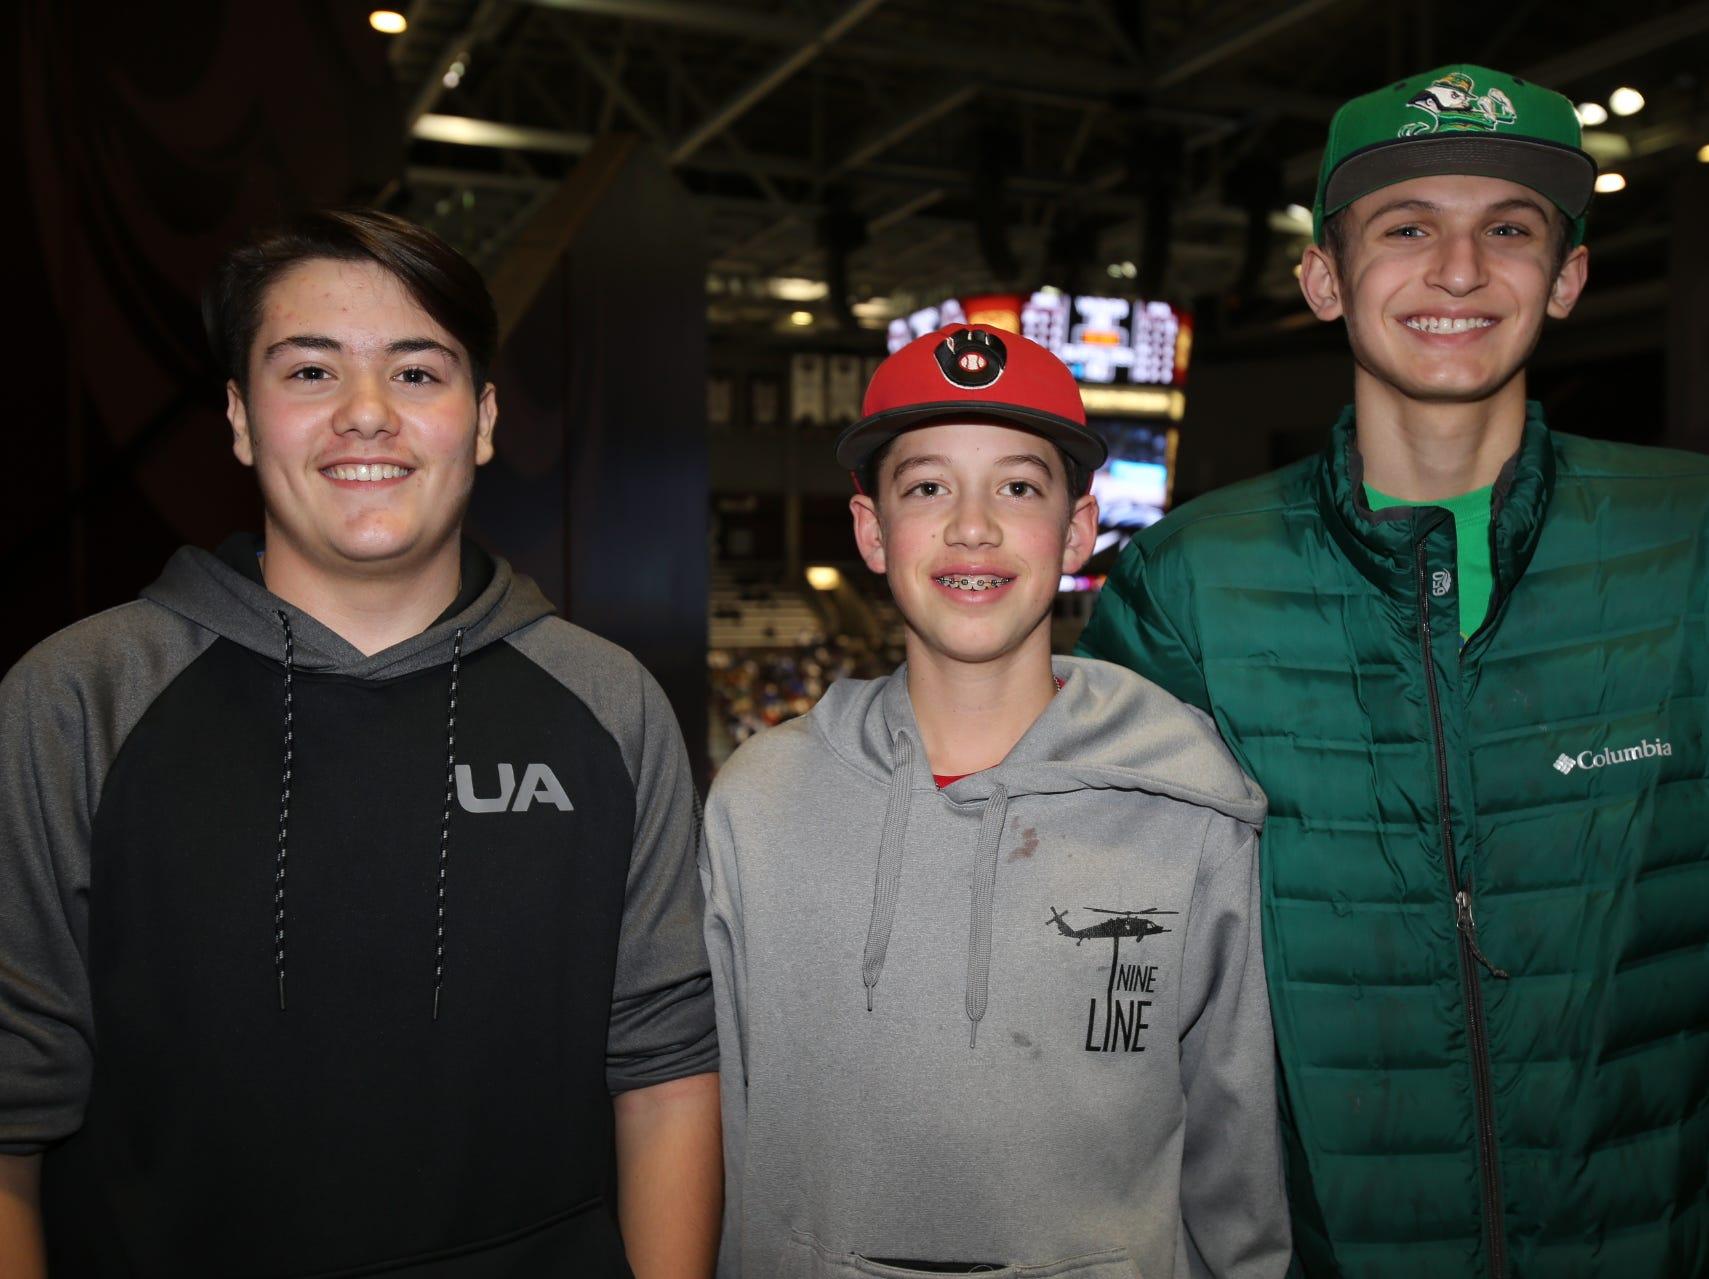 Cole Dobbs, Brady Buckman, and Gus Dauer